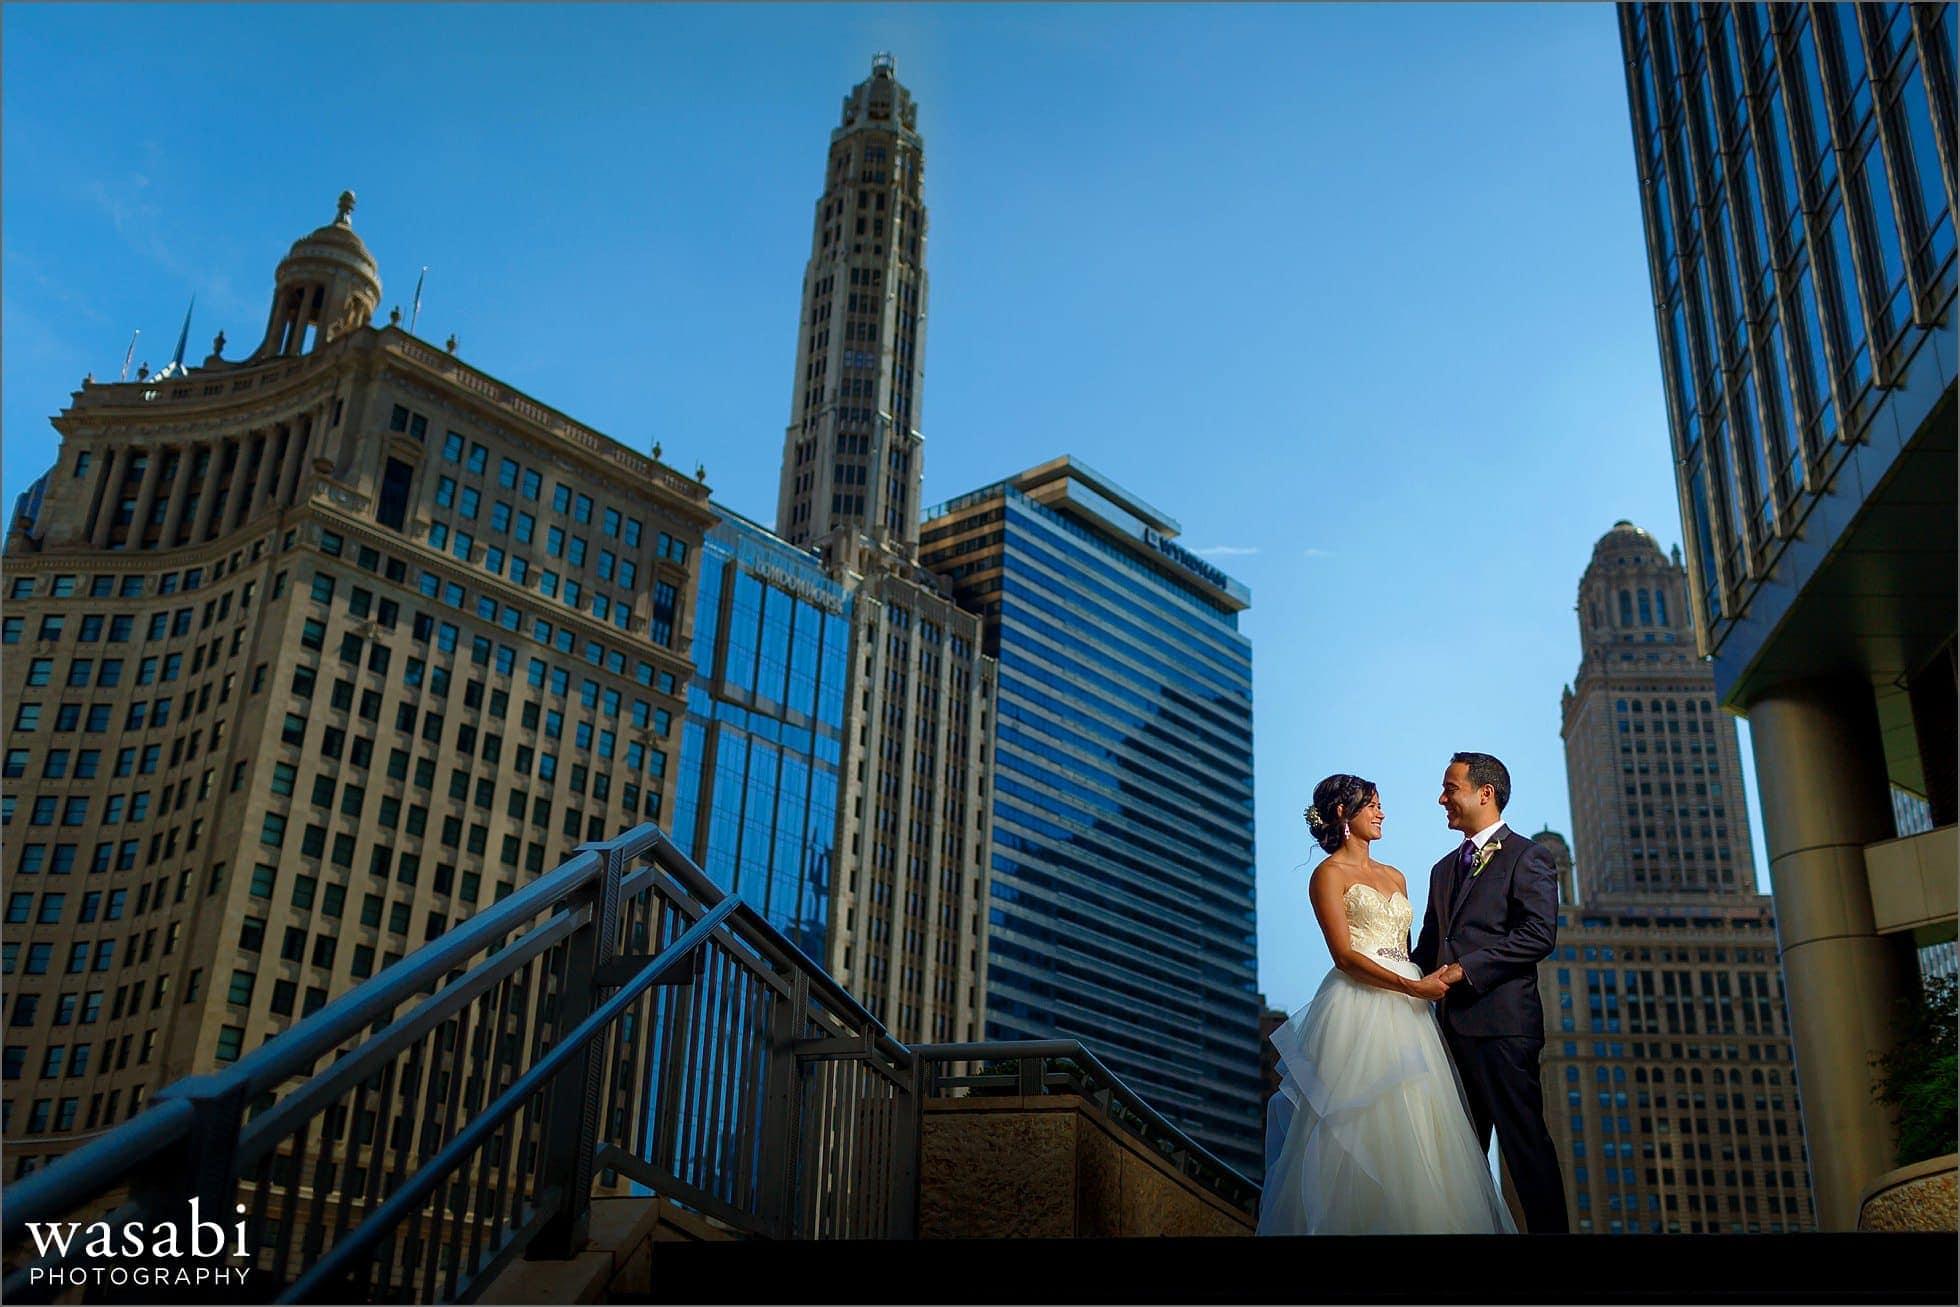 lit blue sky wedding portrait with chicago skyline in background